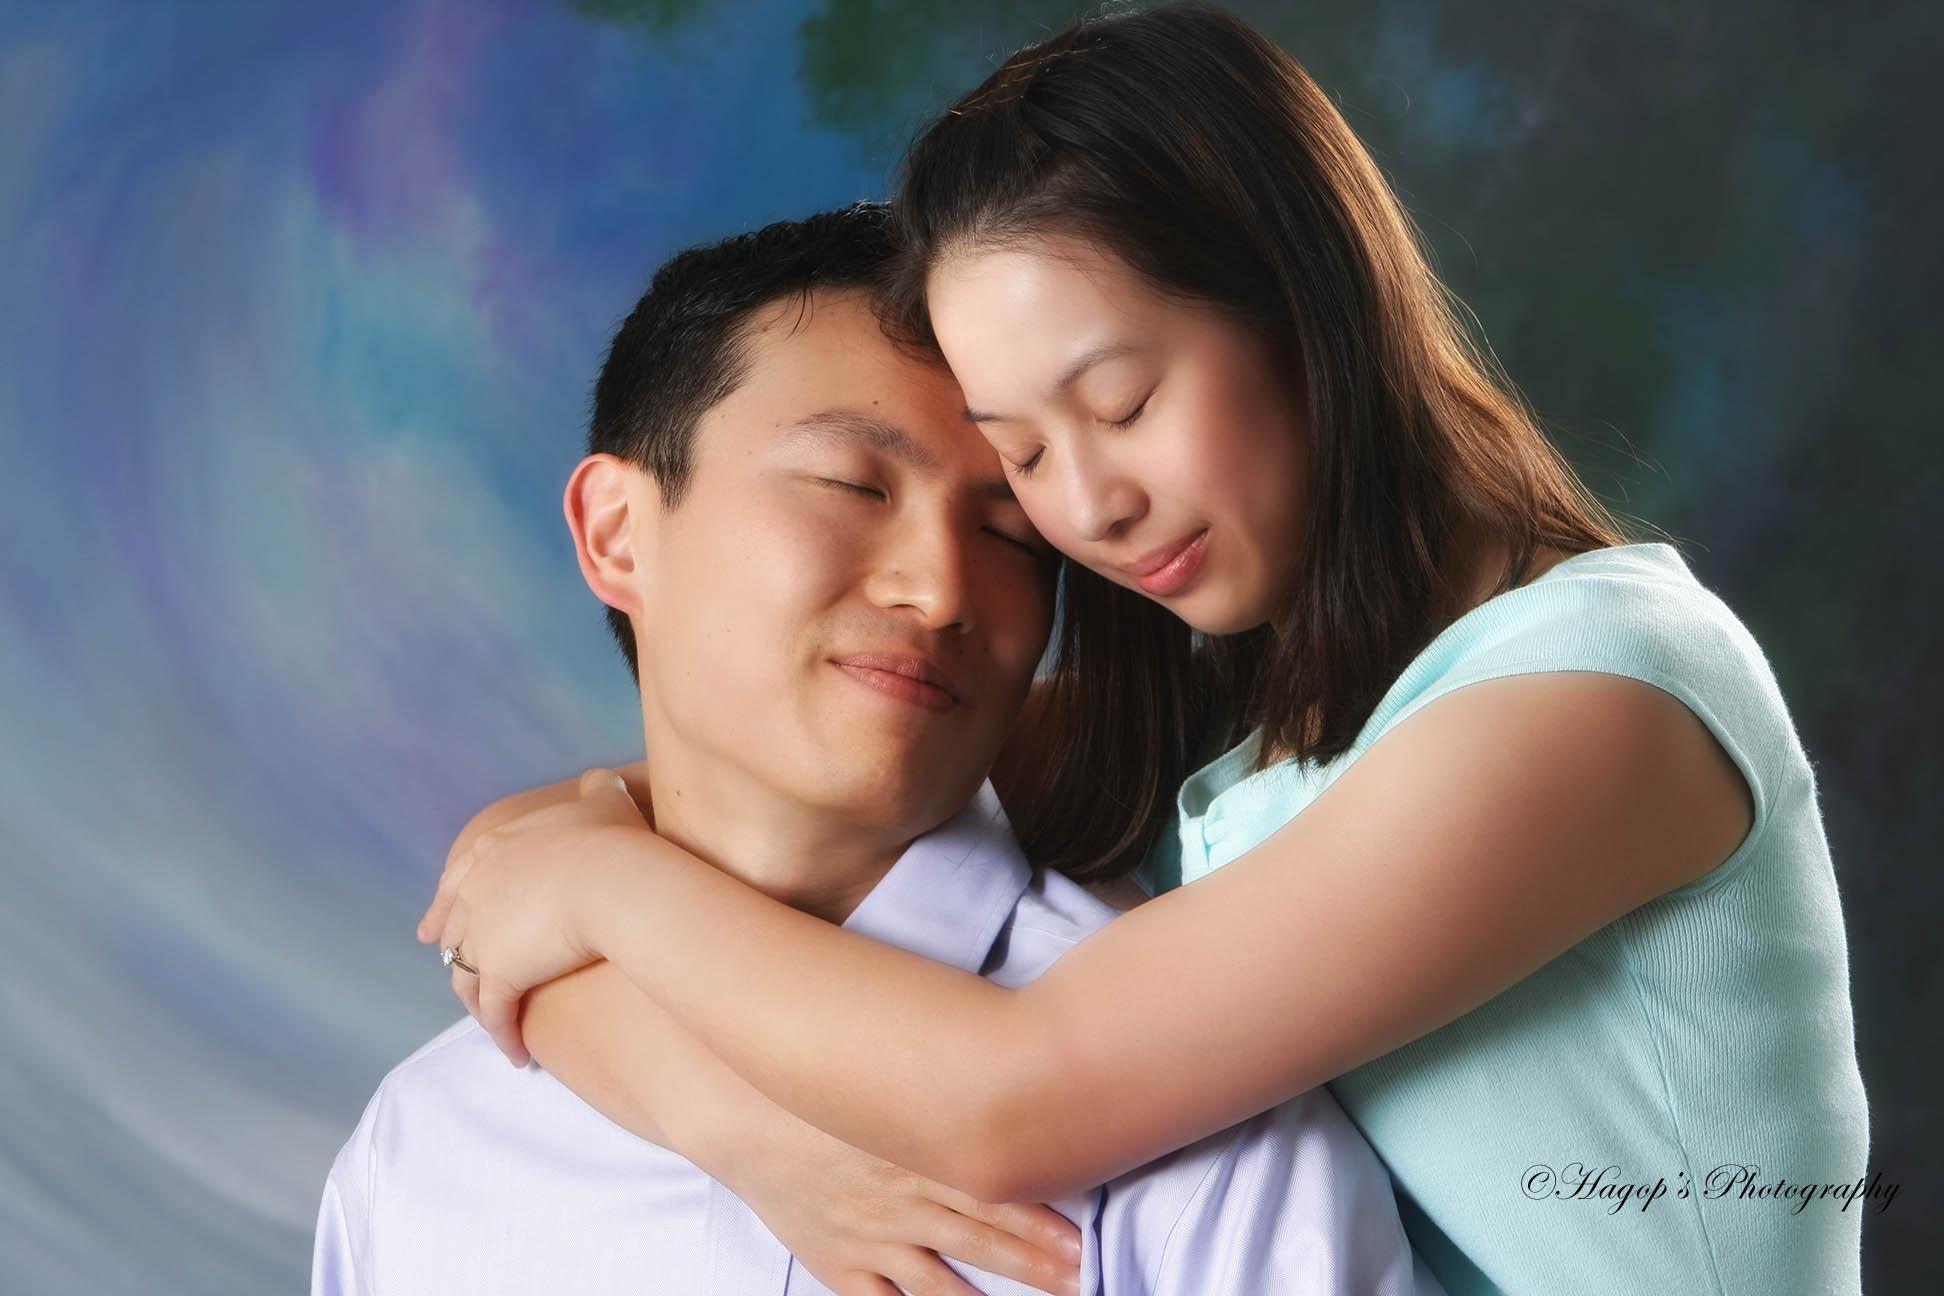 engaged couple romantic studio portrait